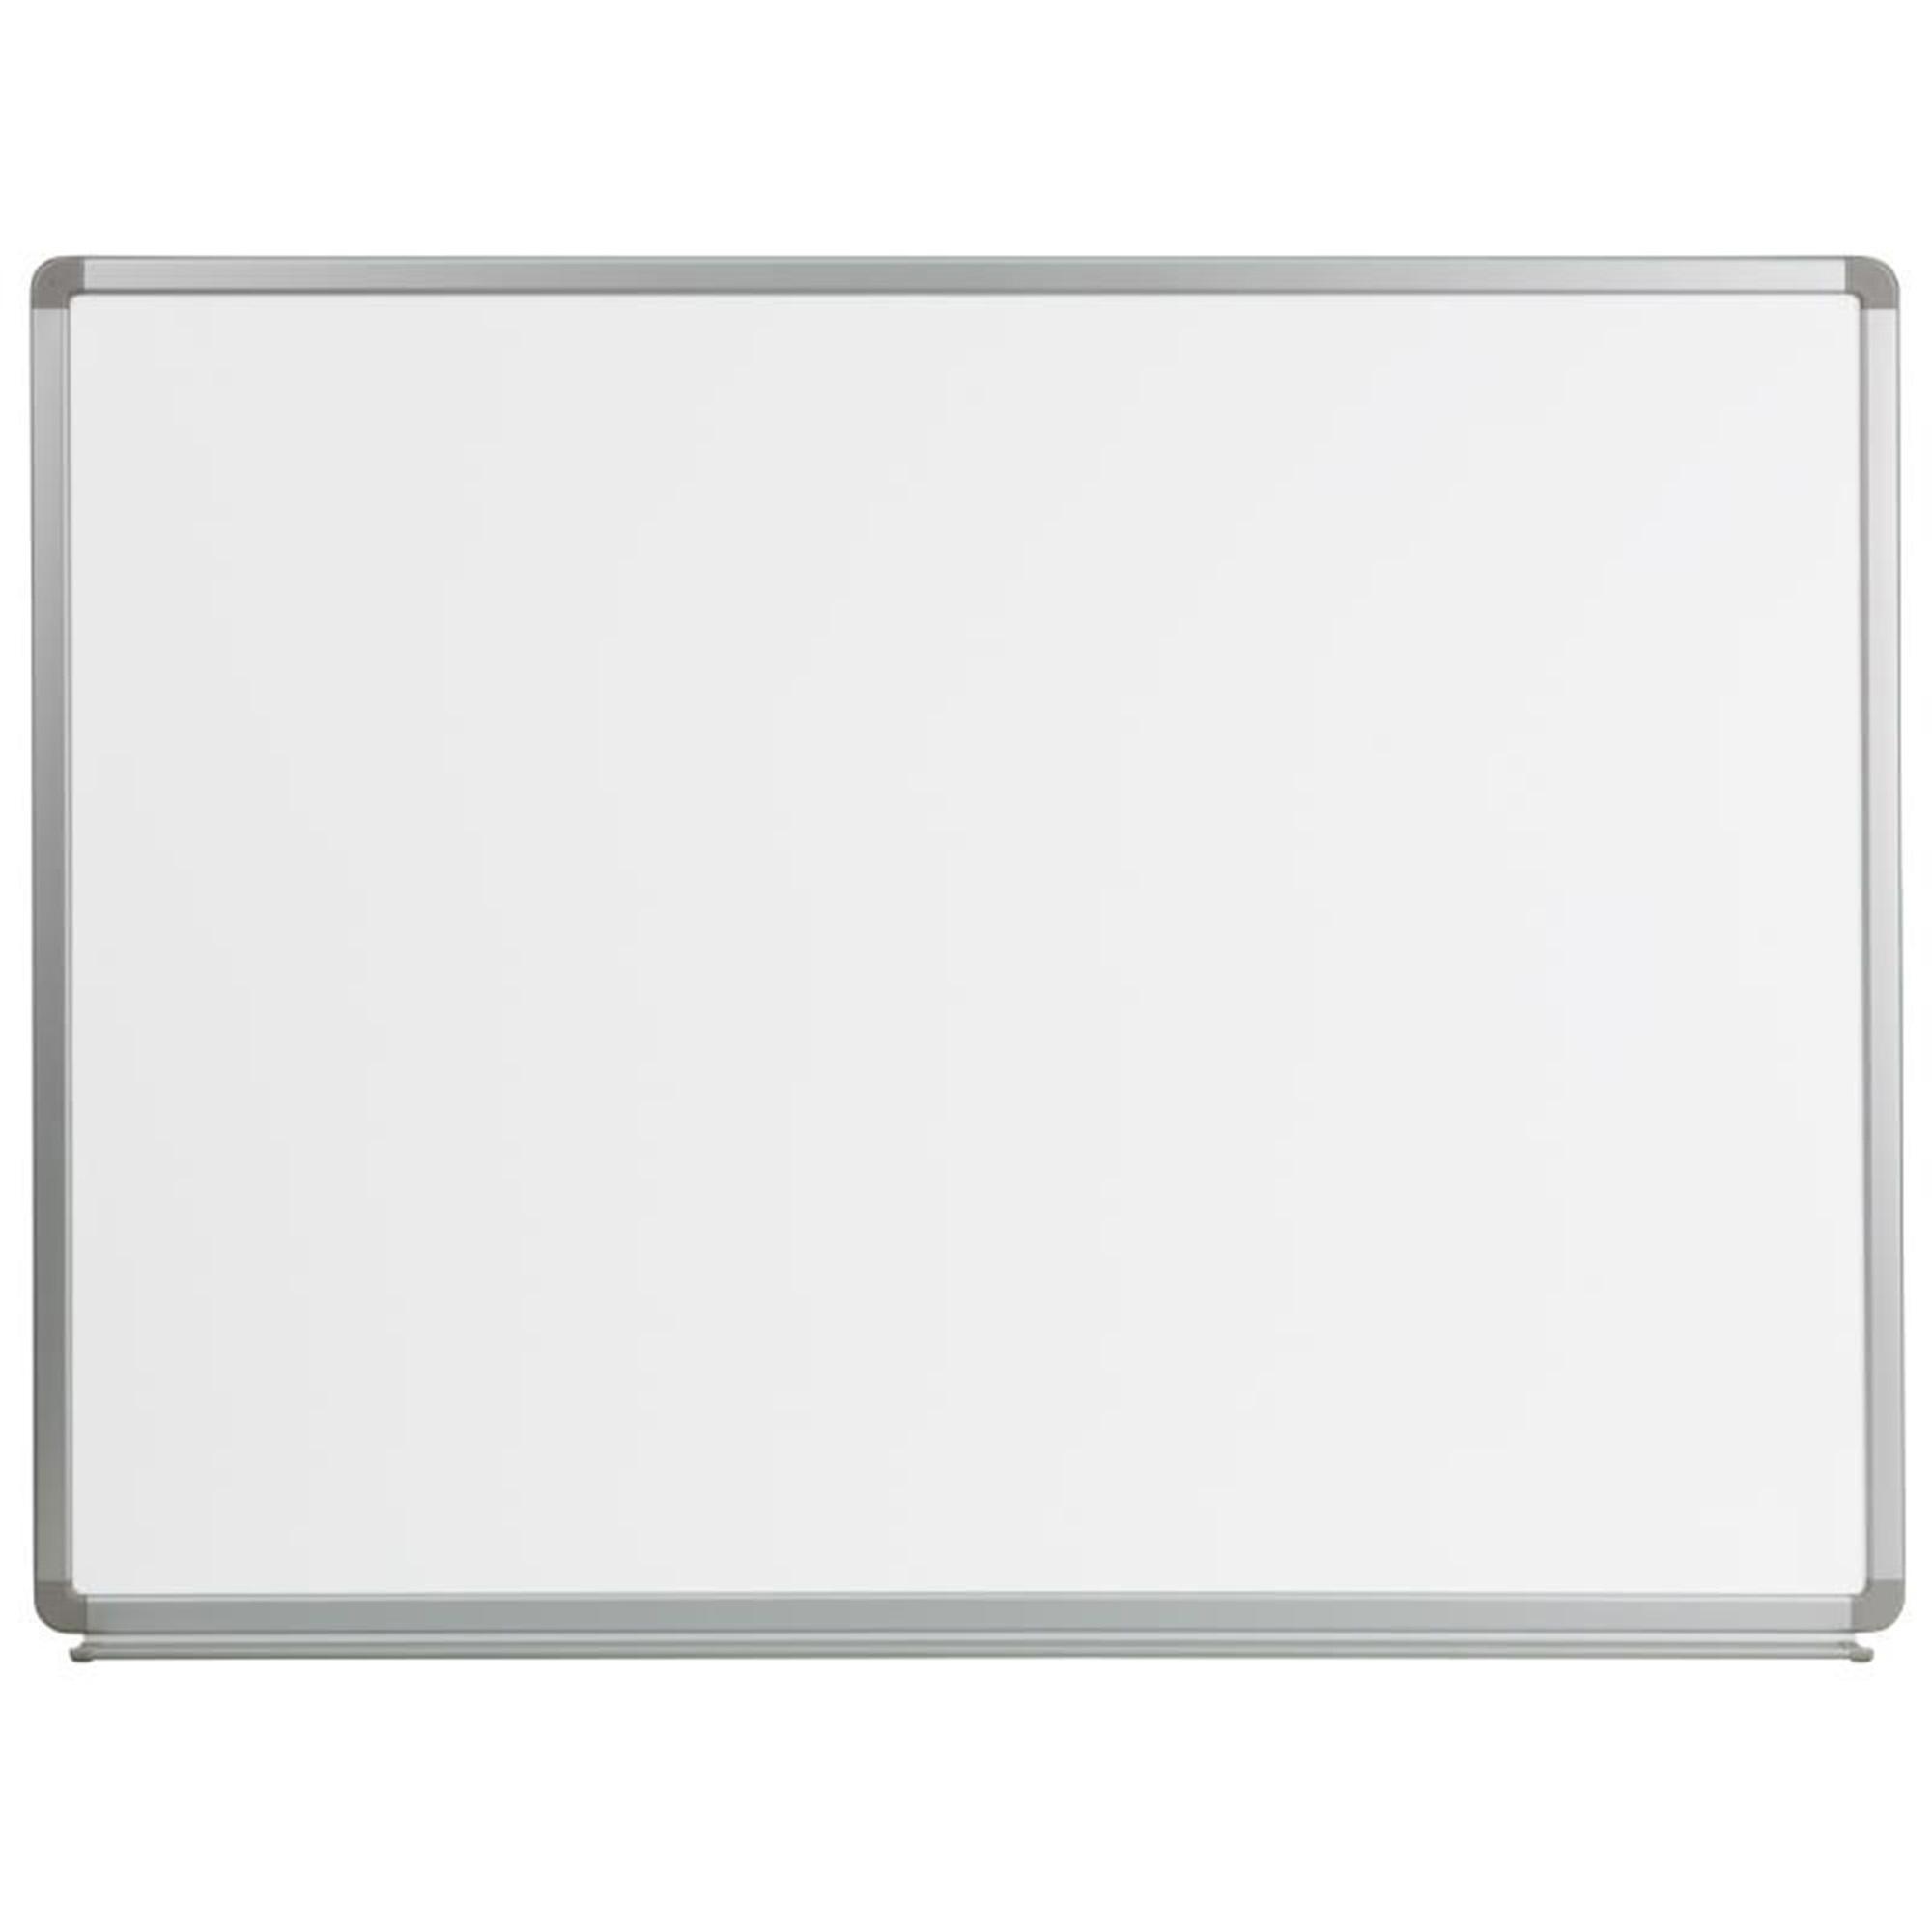 Offex 4' W x 3' H Magnetic Marker Board YU-90X120-WHITE-GG